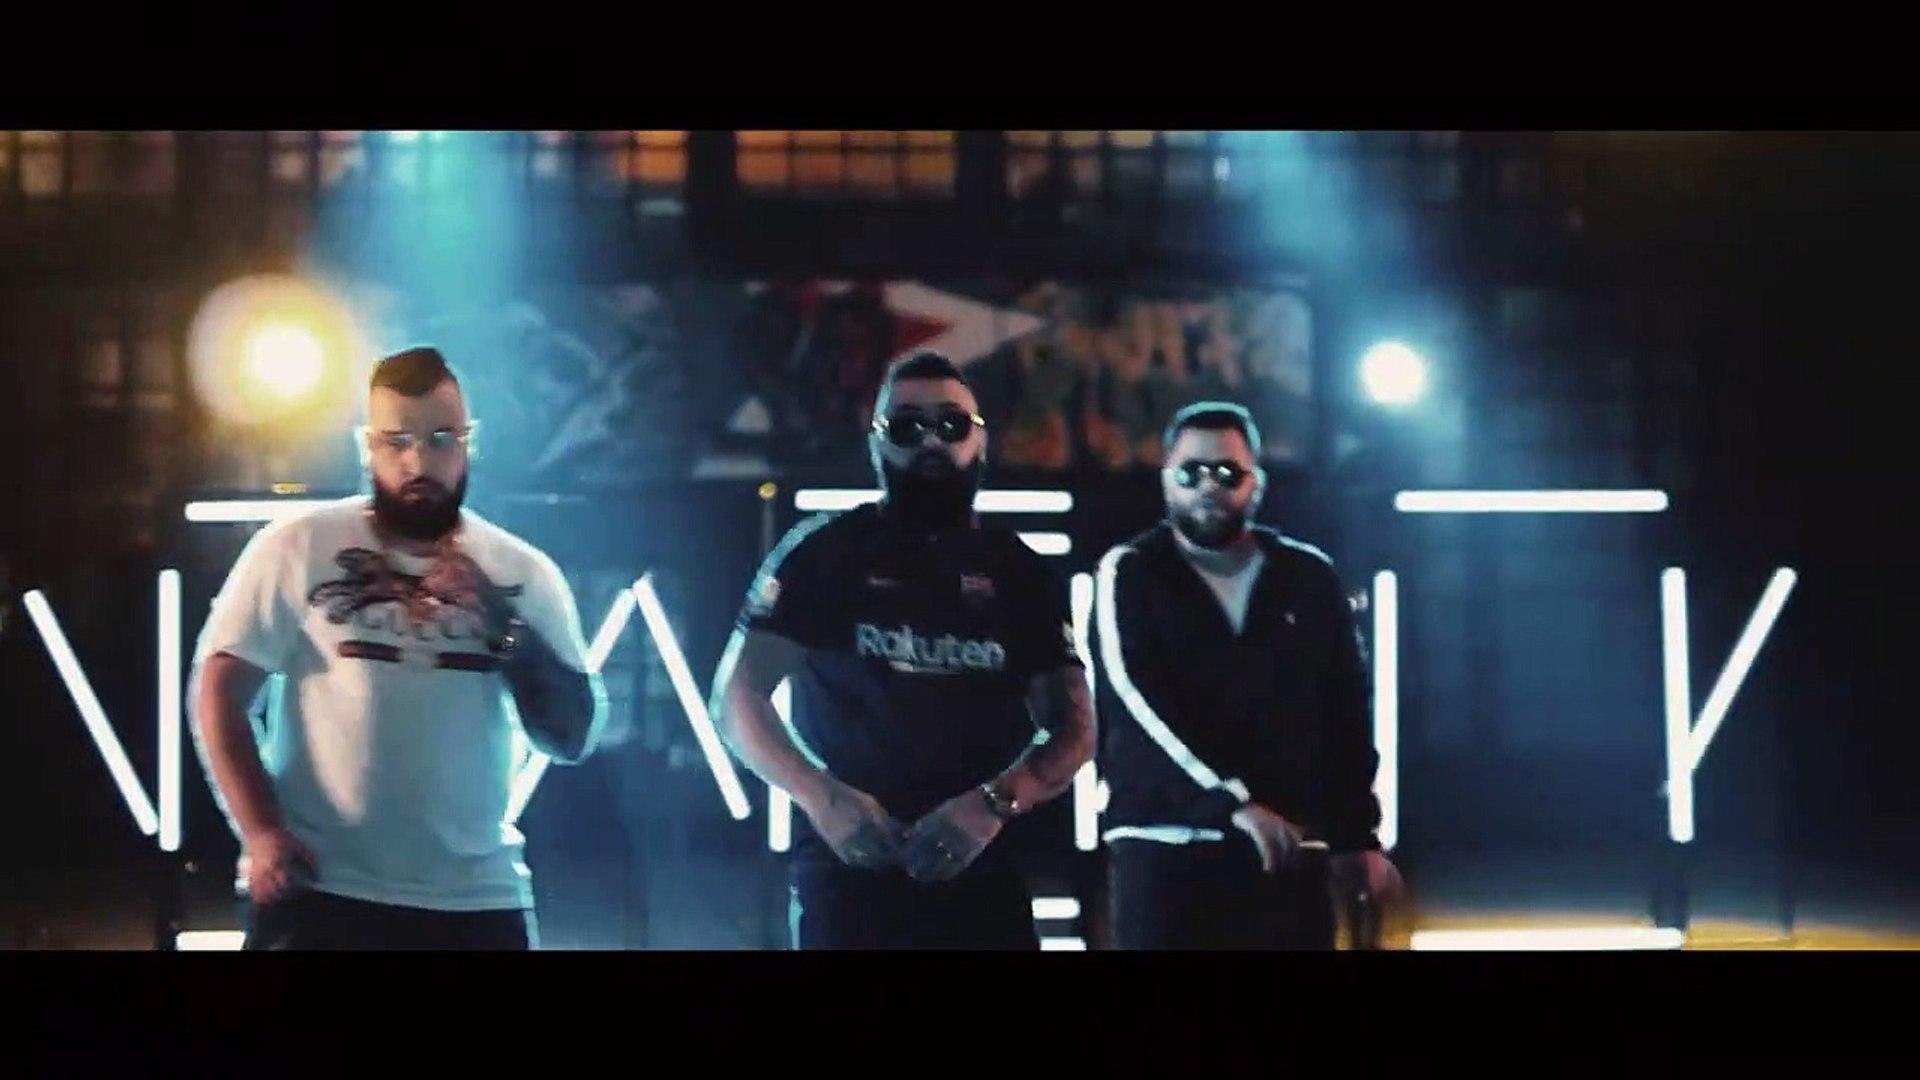 Jala Brat x Buba Corelli x Coby - Ona'e (Official Video) (Reverse Napad Unazad)